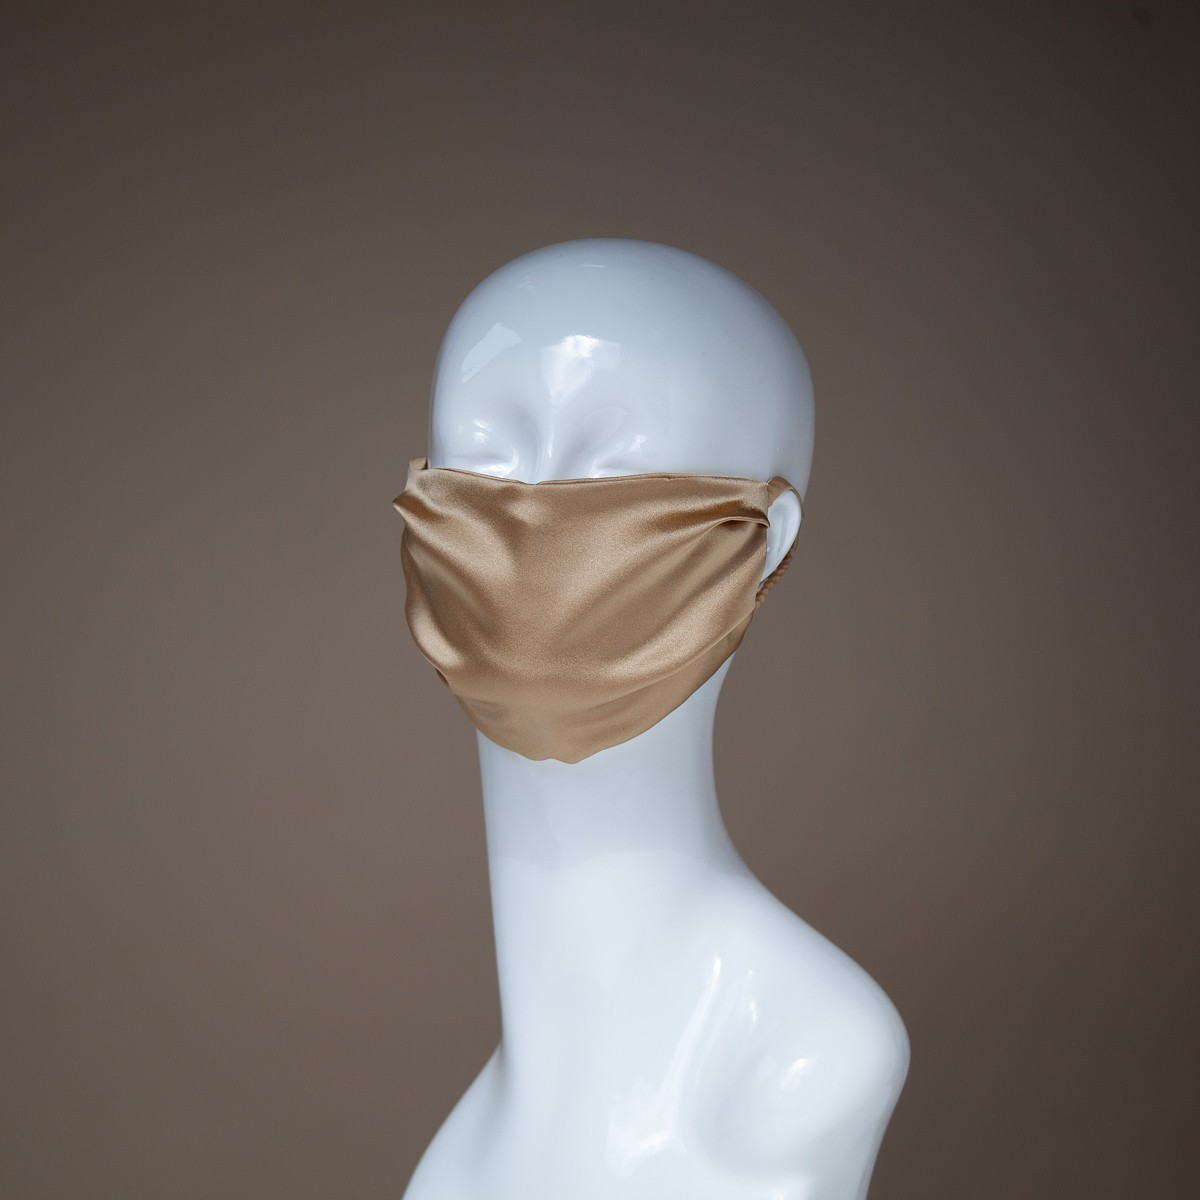 New Mask 新色 Gold x Gold 販売スタート!